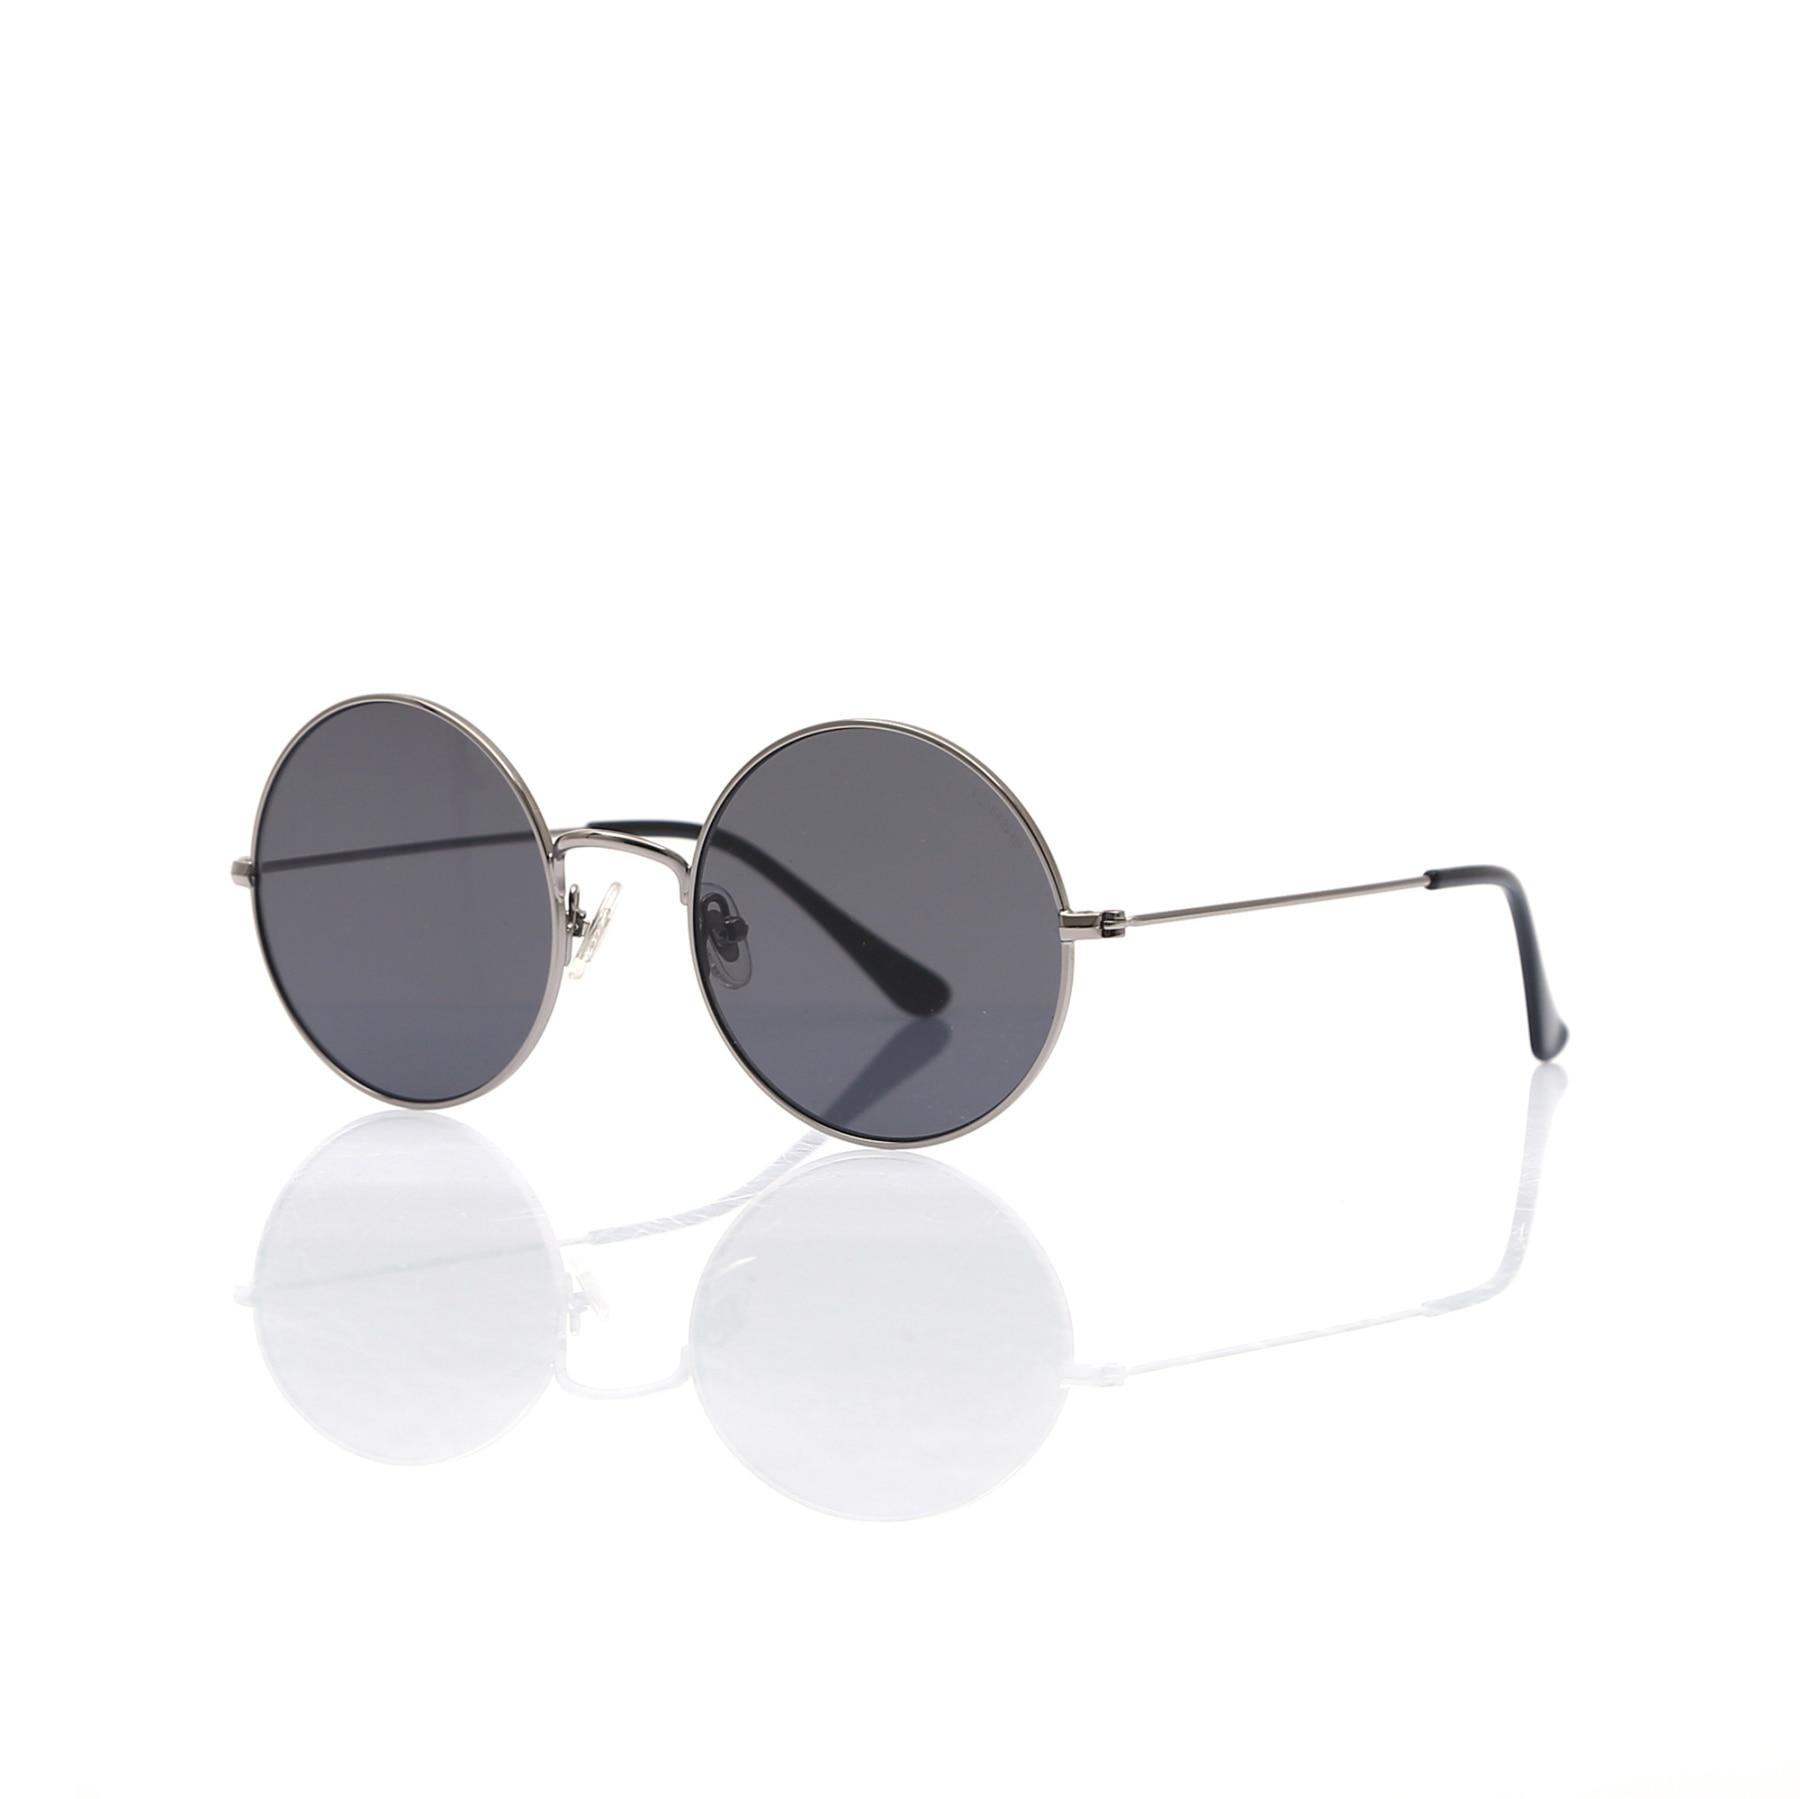 Unisex sunglasses os 2534 09 s metal silver organic round round 50-20-145 osse